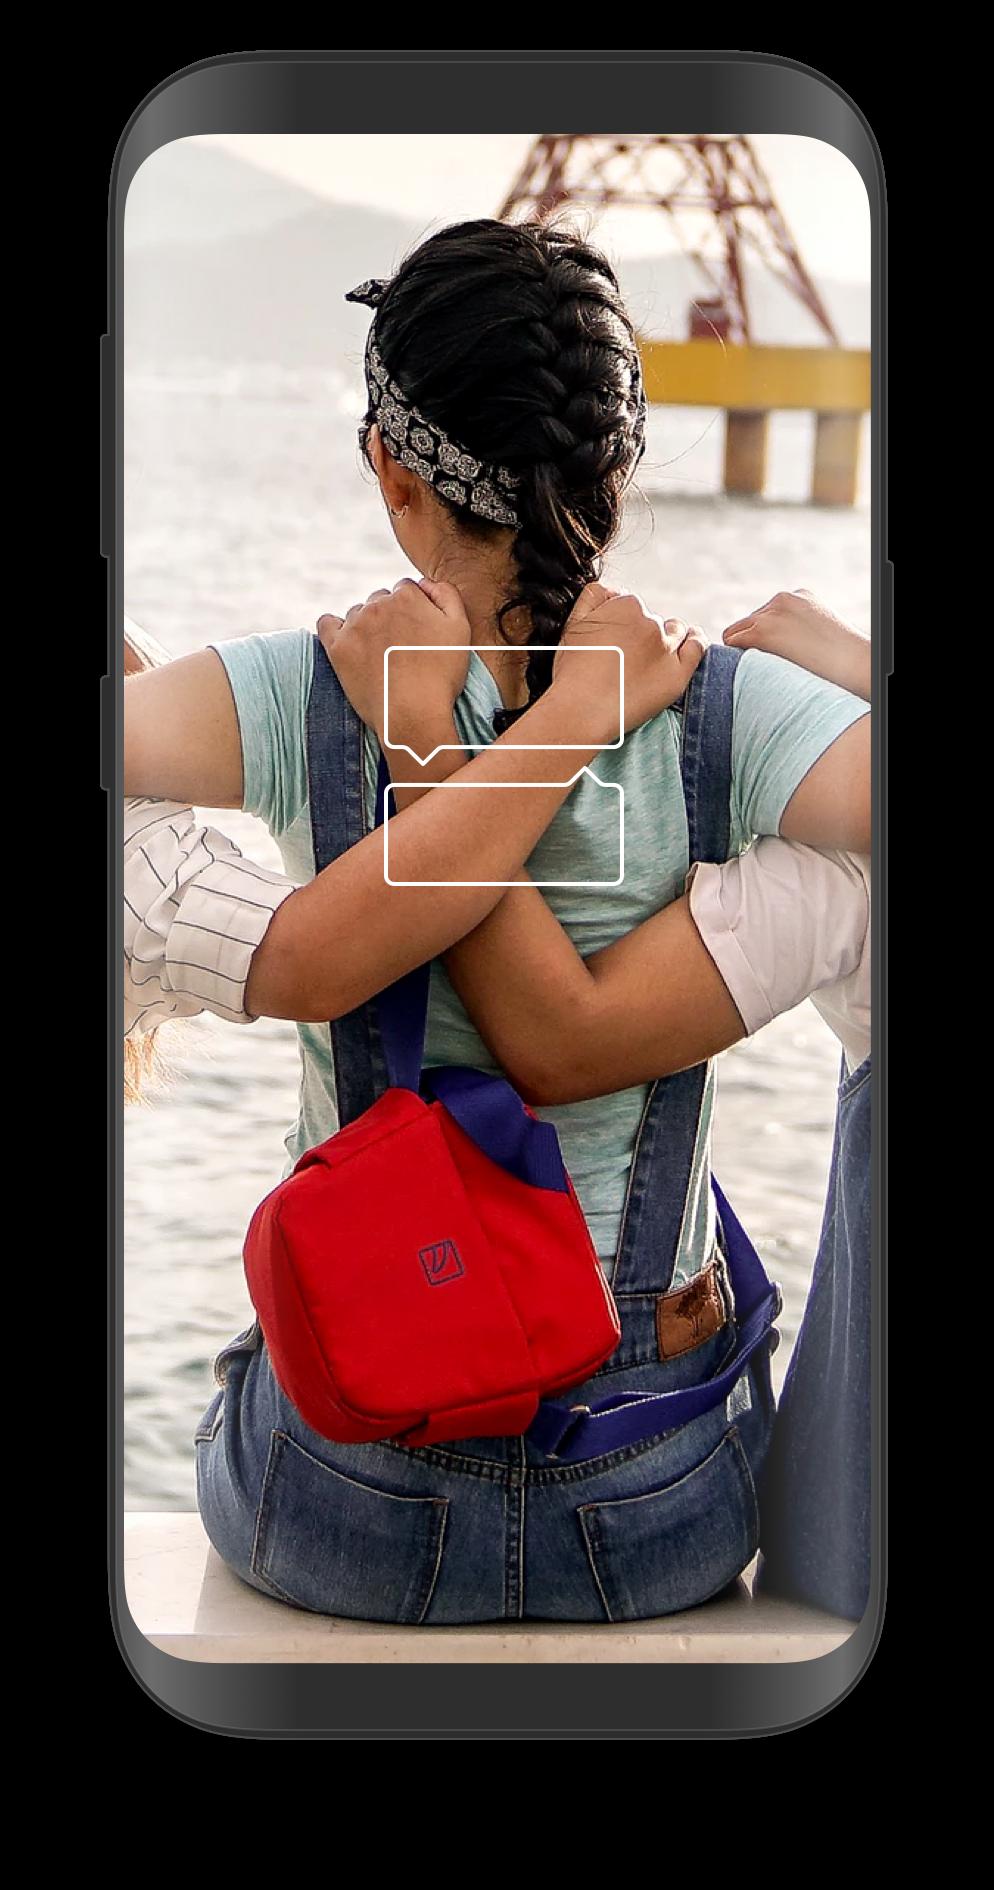 phone-2-1.png